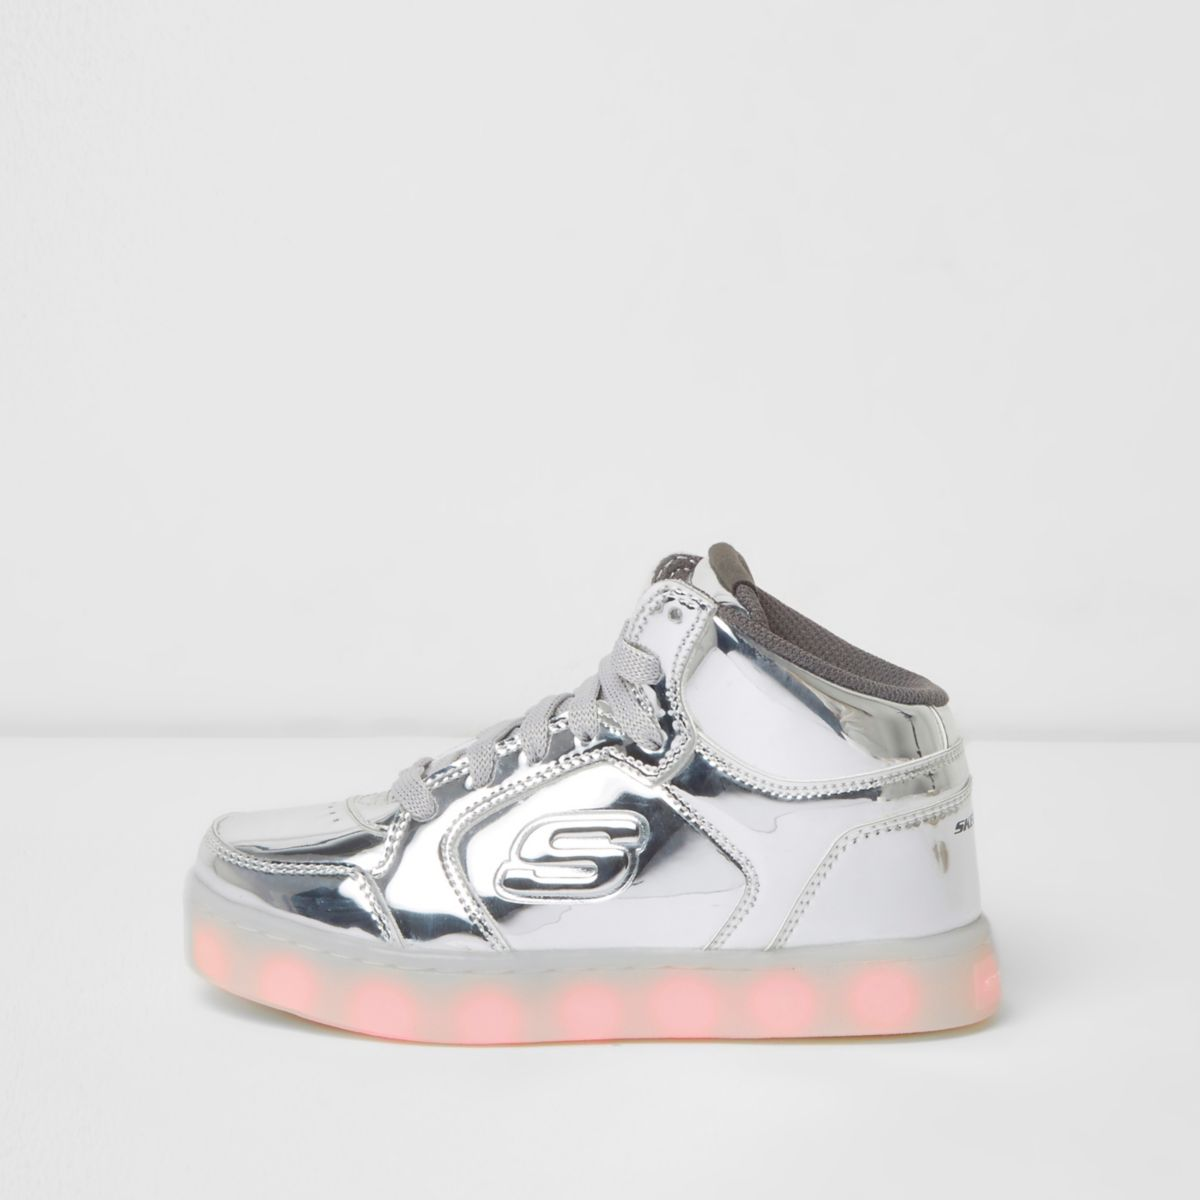 Kids Skechers silver light up hi top trainers